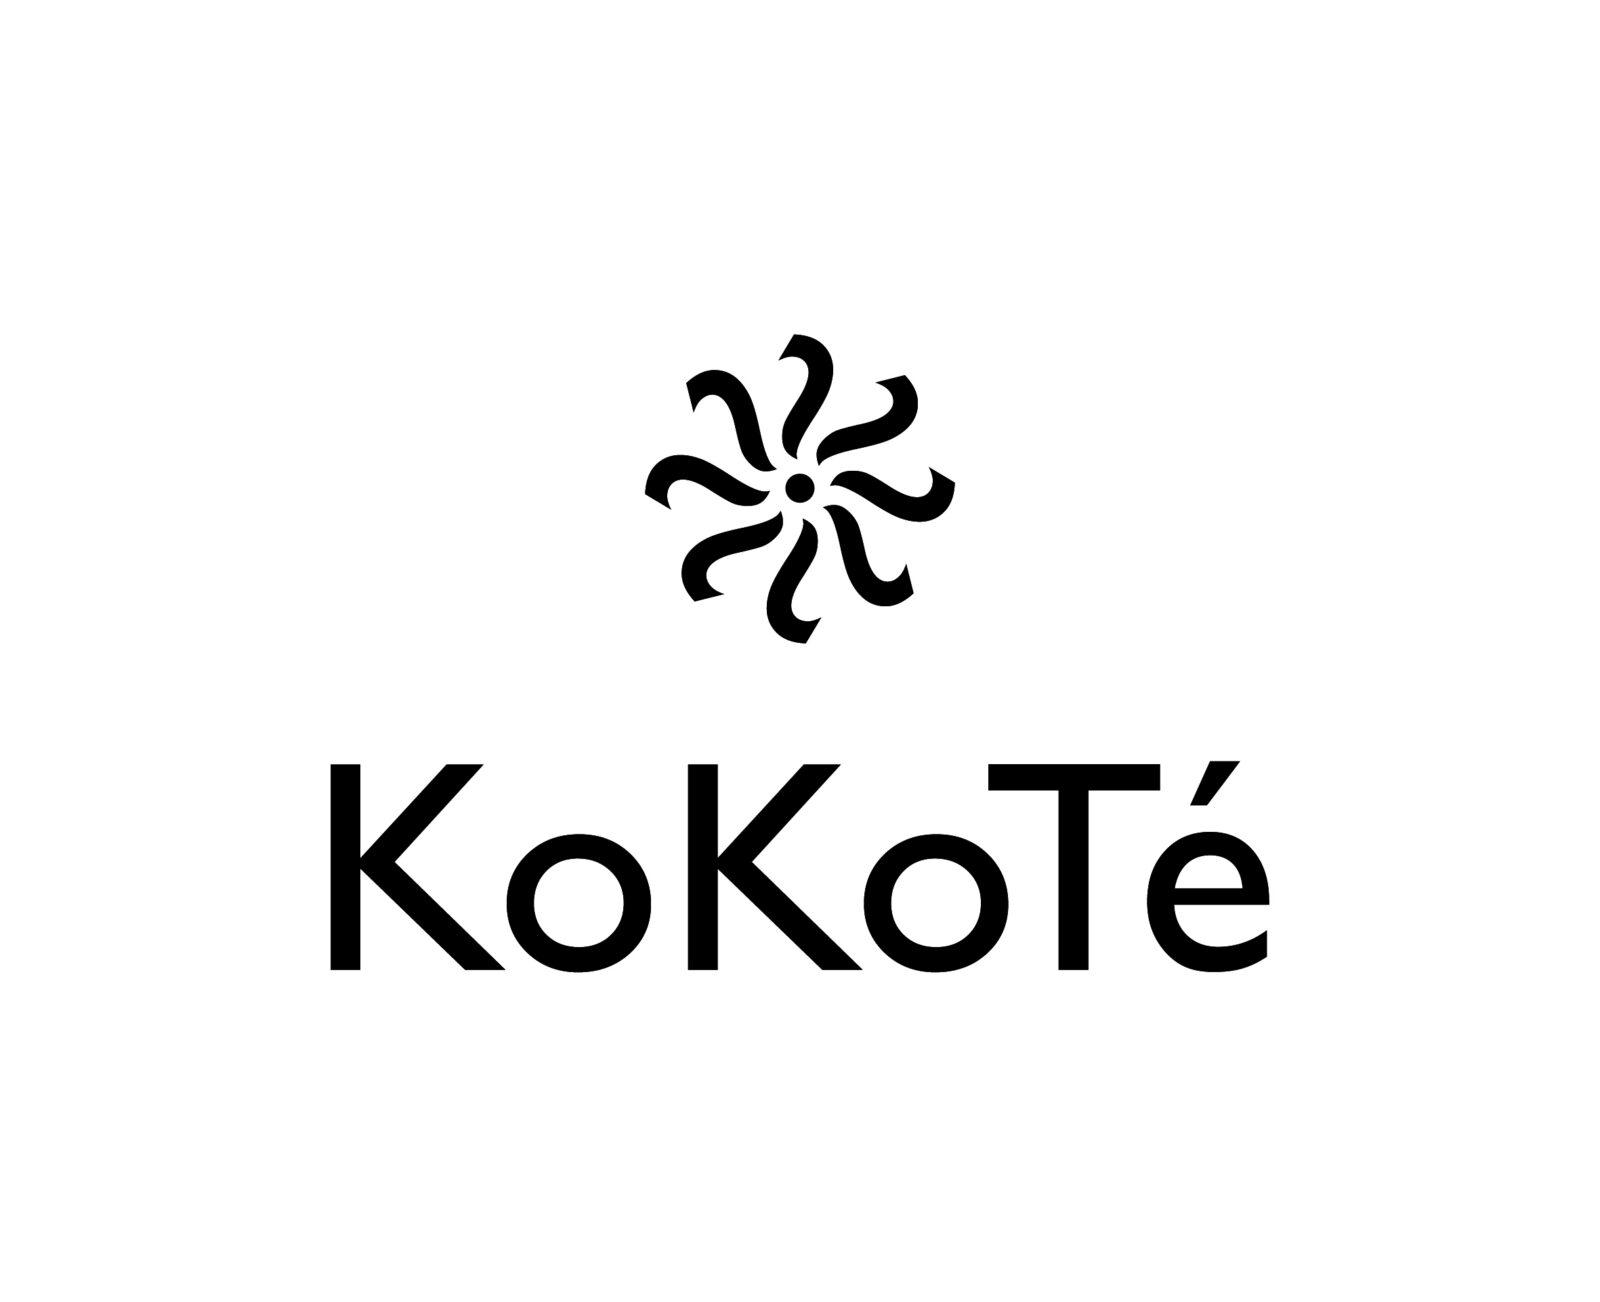 Ko Ko Te pos ohne Claim 2019